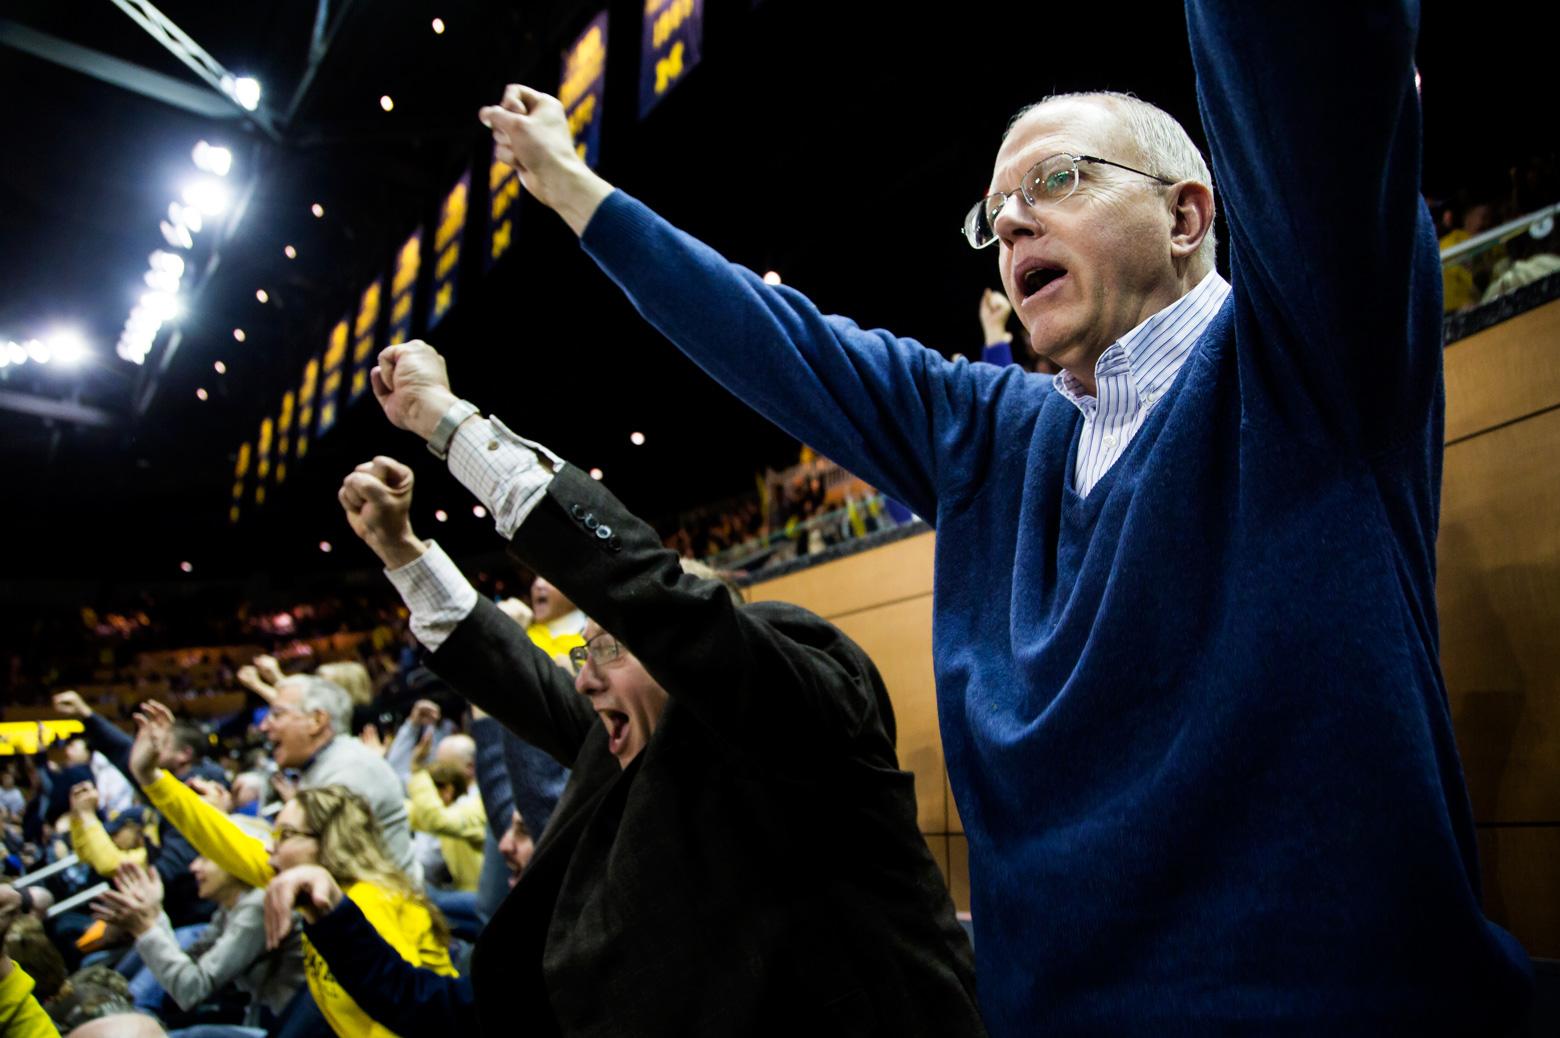 Dave Munson celebrating a Michigan basketball victory with Michigan Engineering alumnus Randy Brouckman